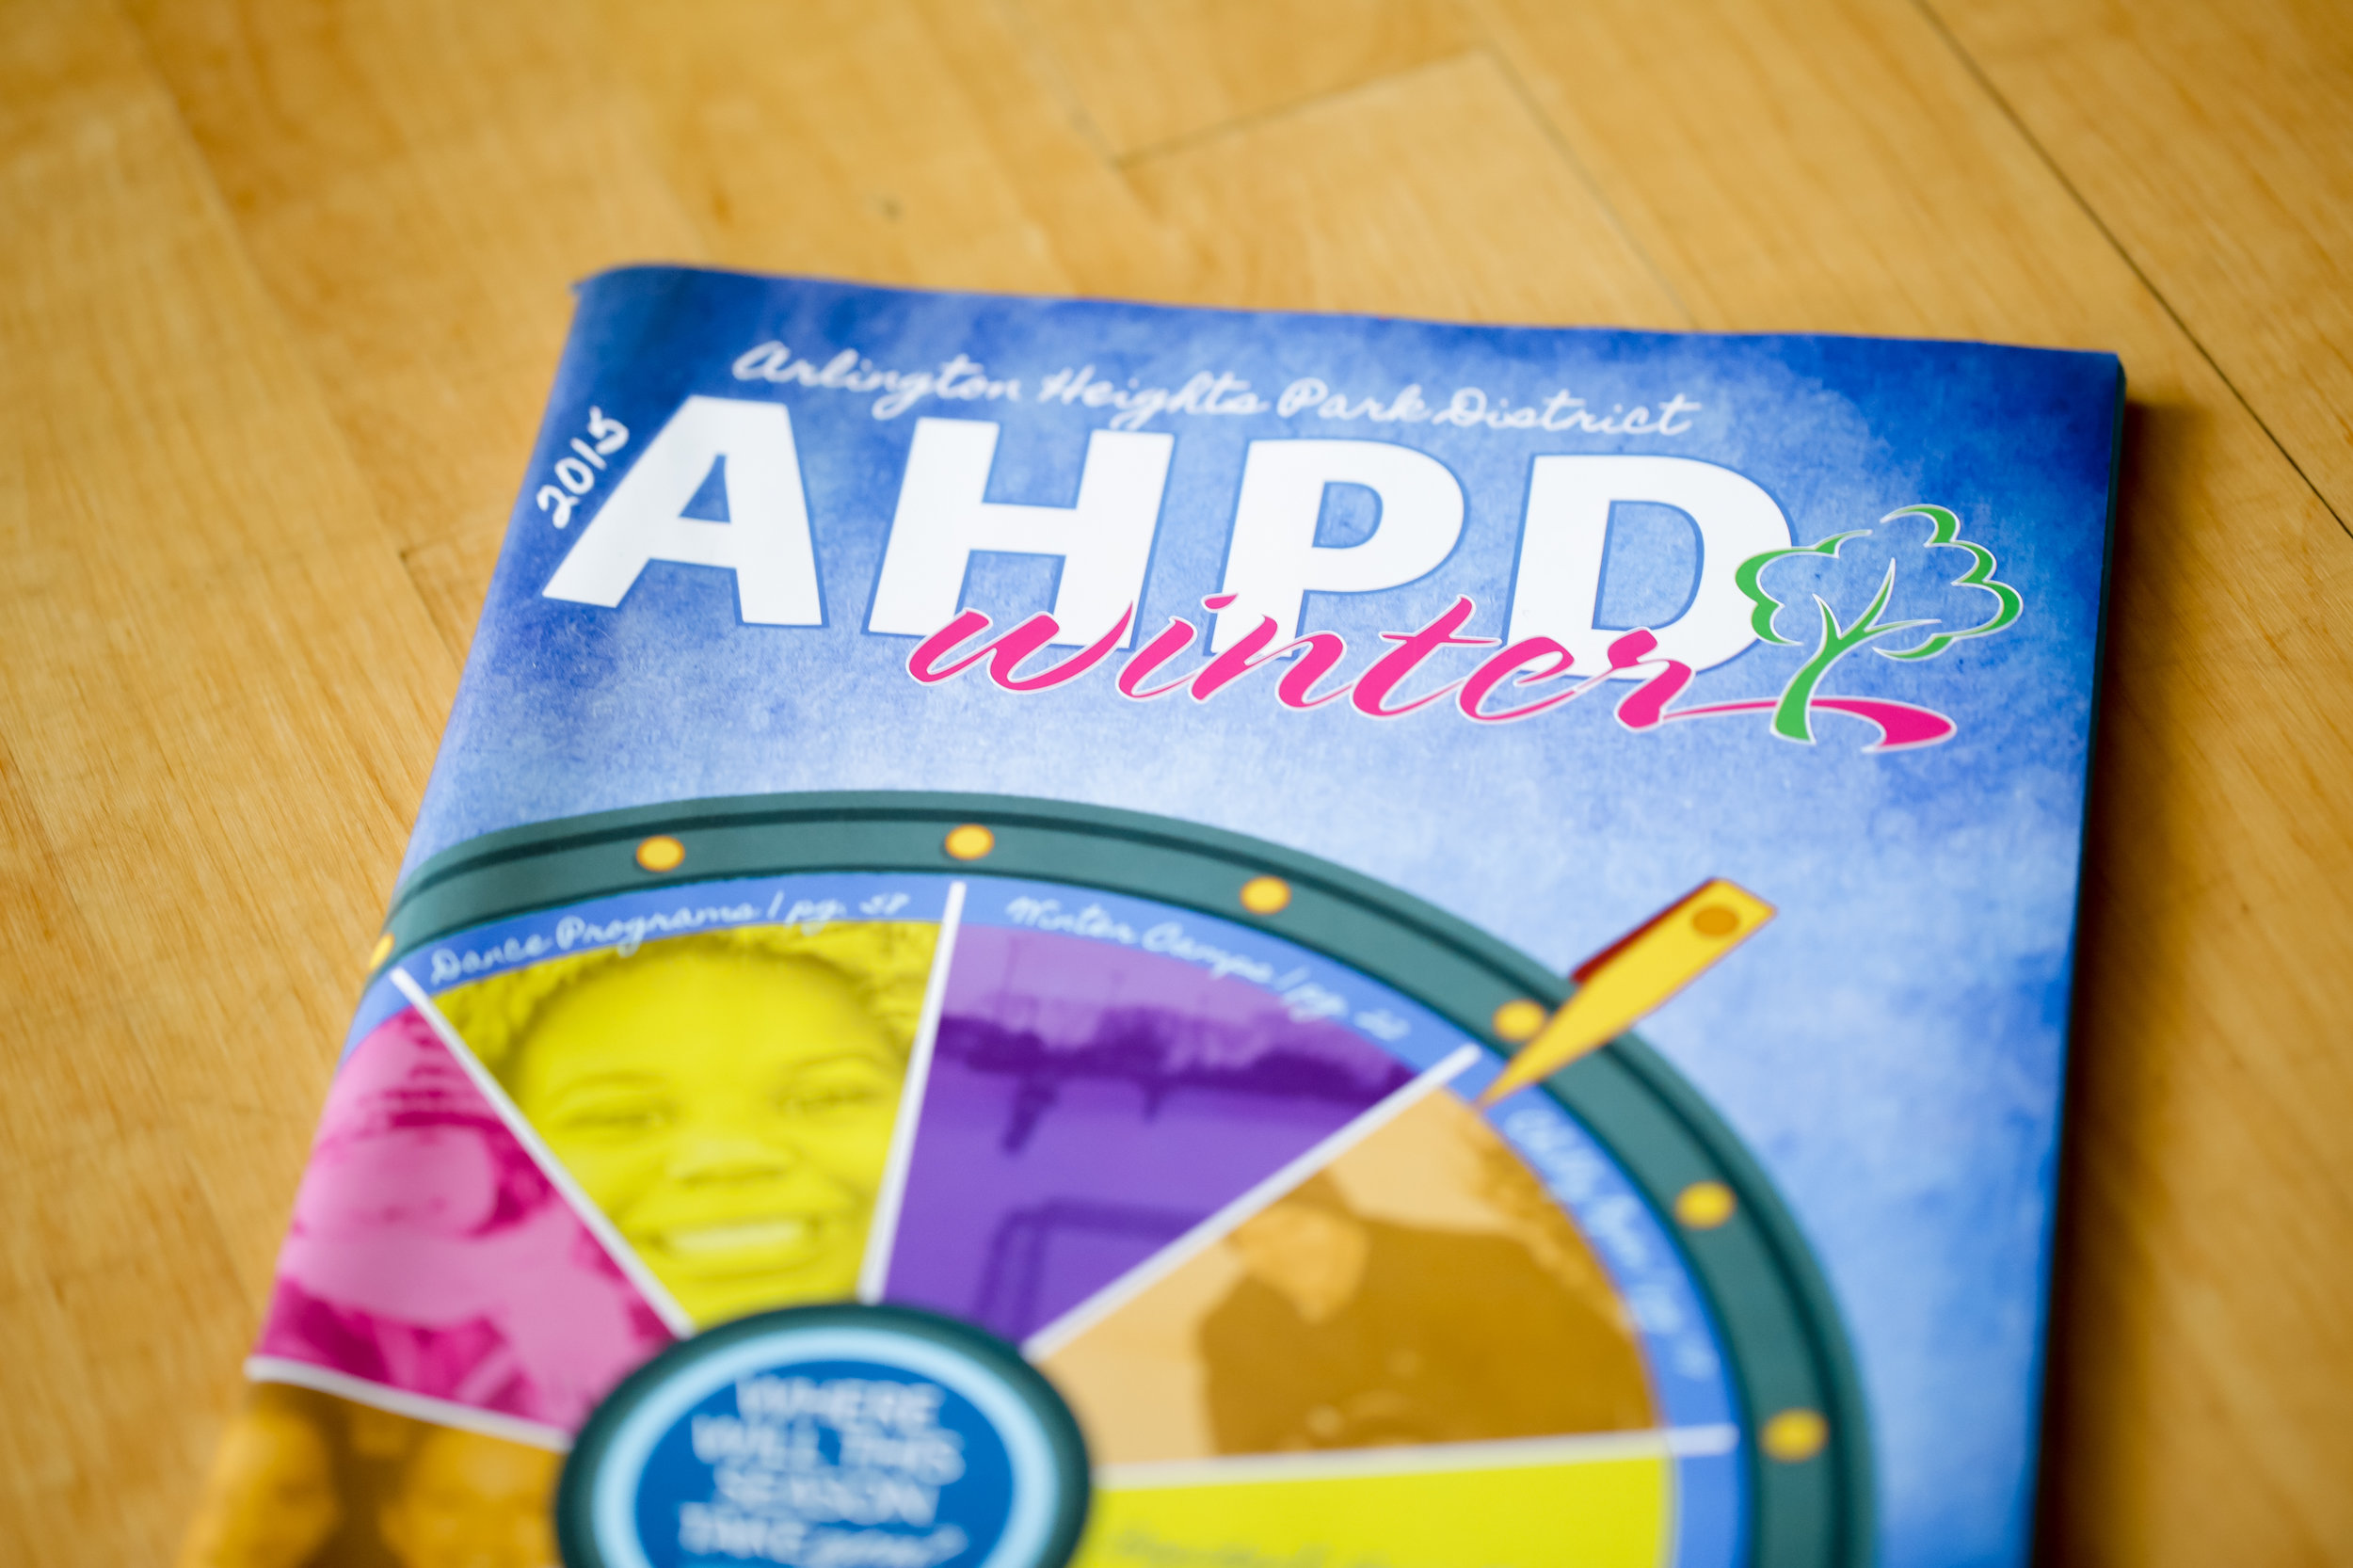 AHPD-433.jpg